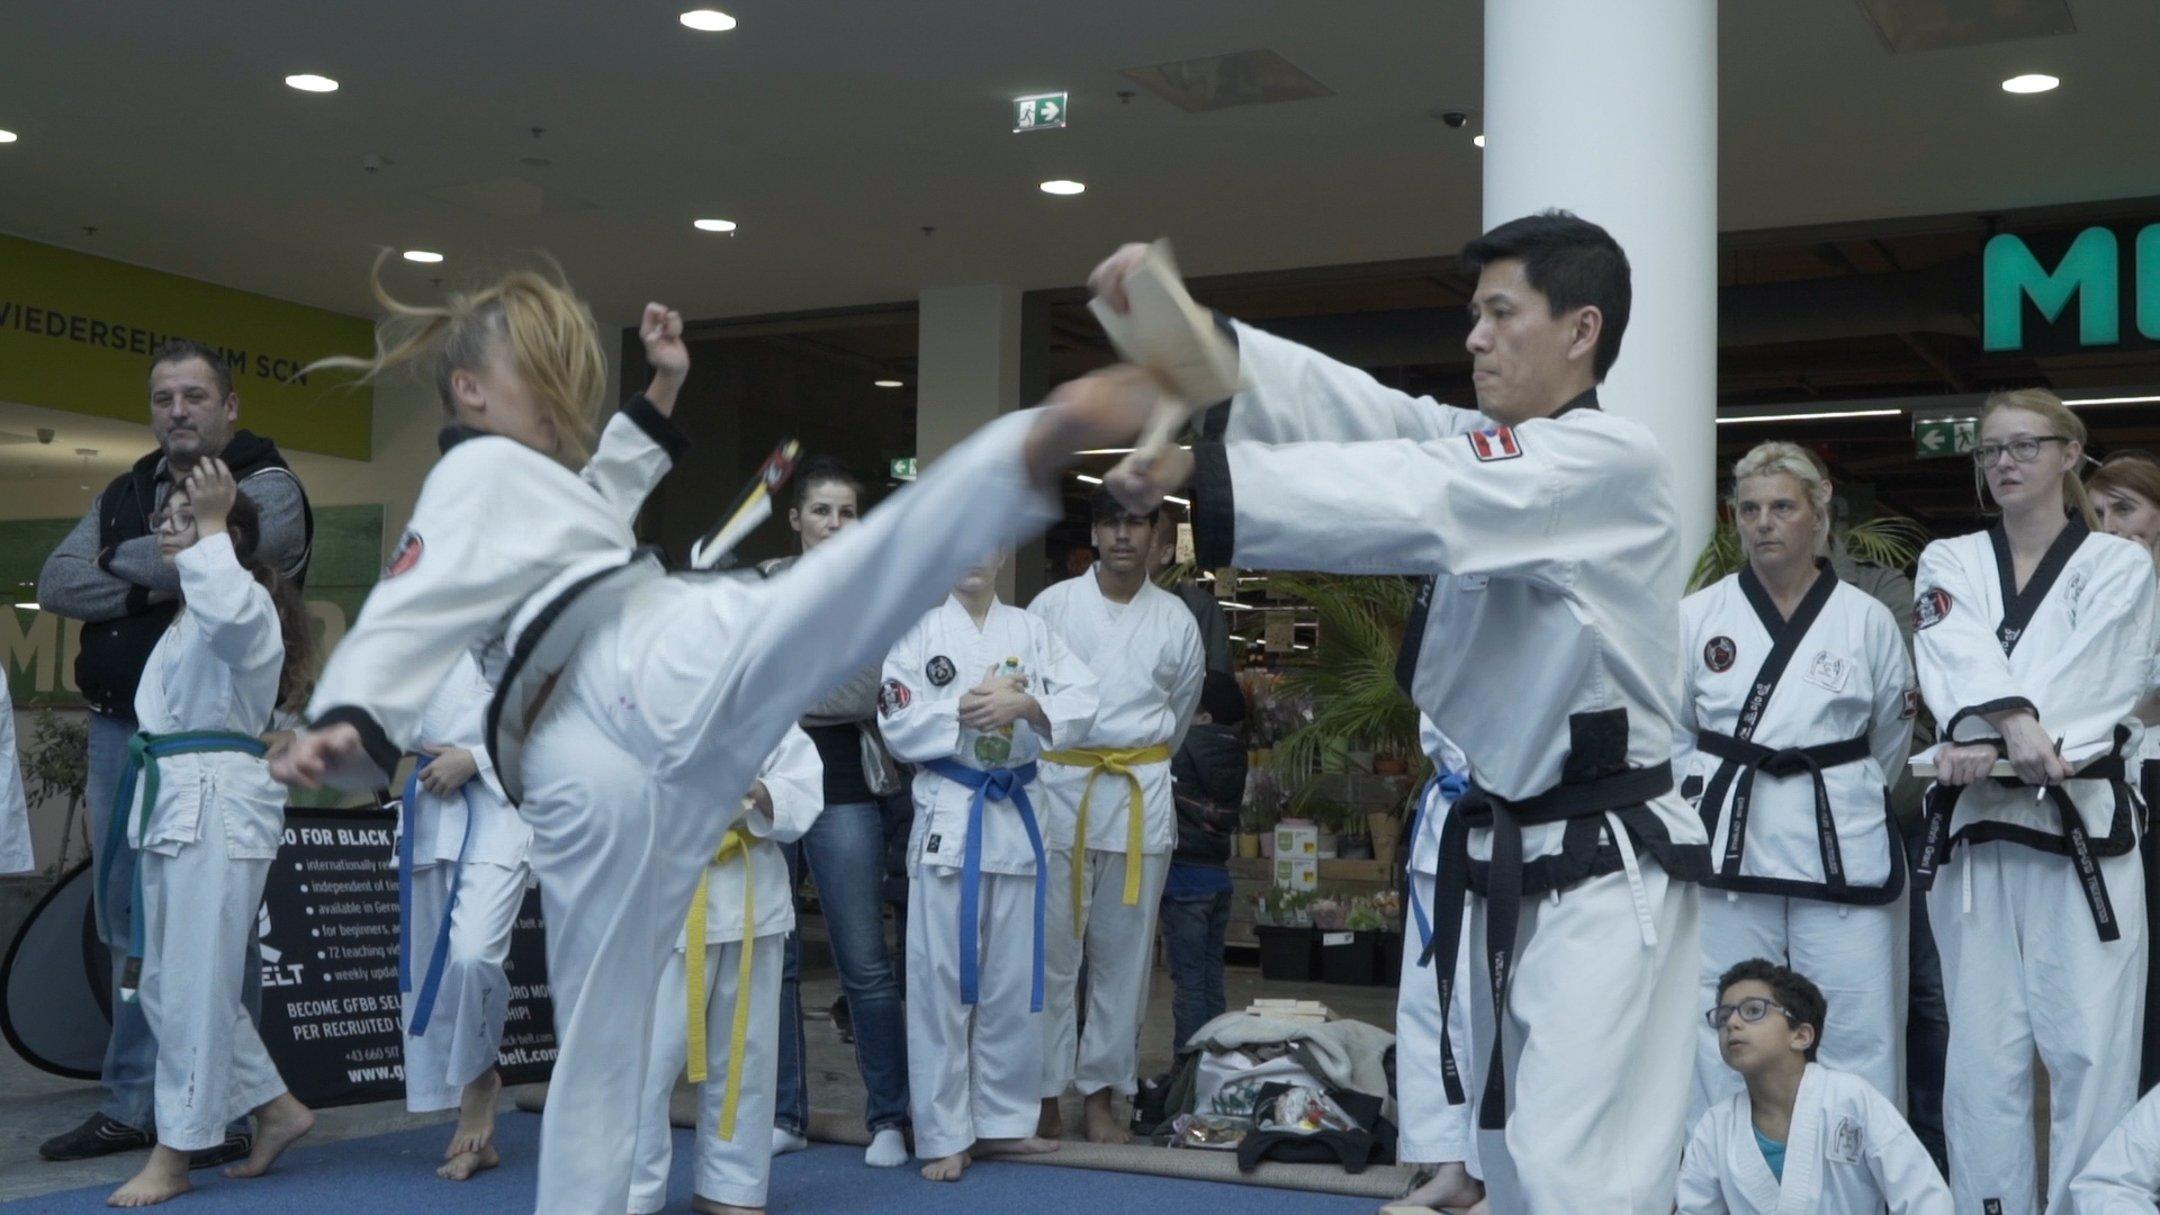 YOUNG-UNG Taekwondo Sommer Turnier Lugner City Wettkampf Kampfsport